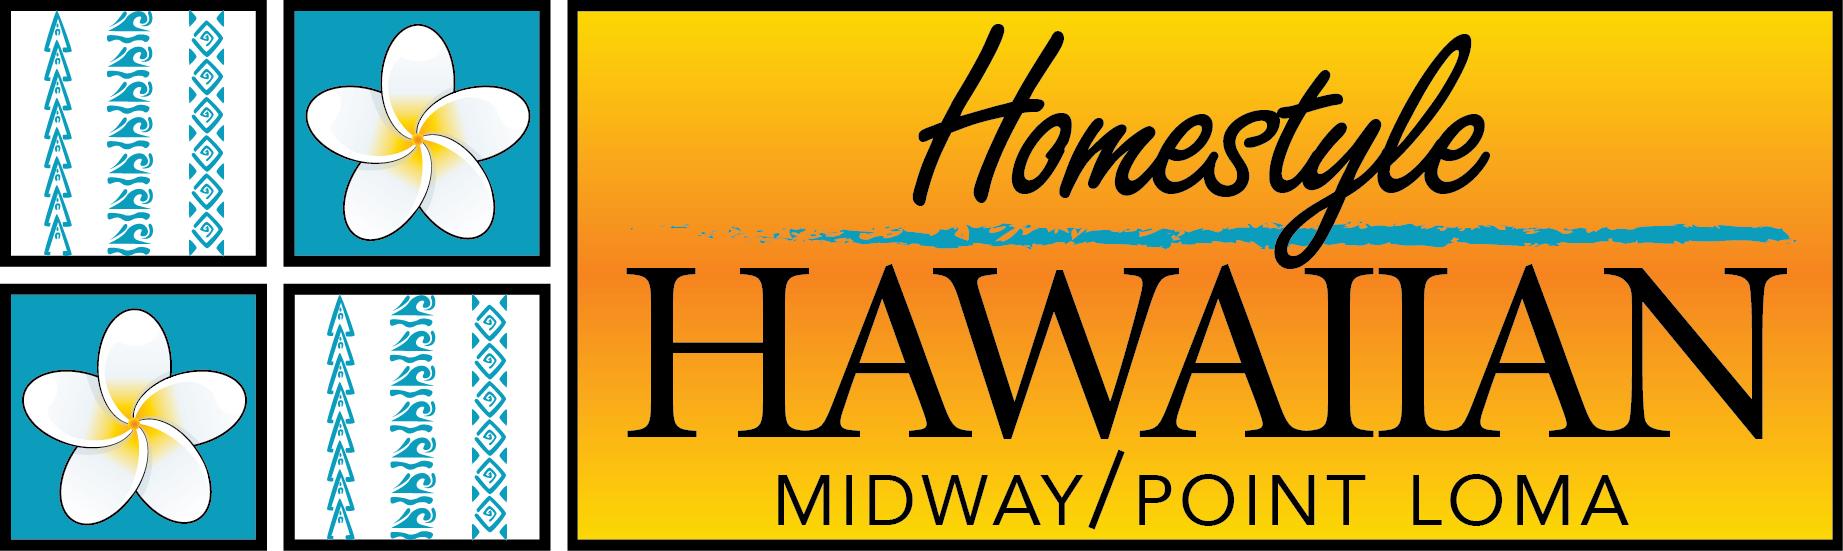 New HH Logo 2017.jpg